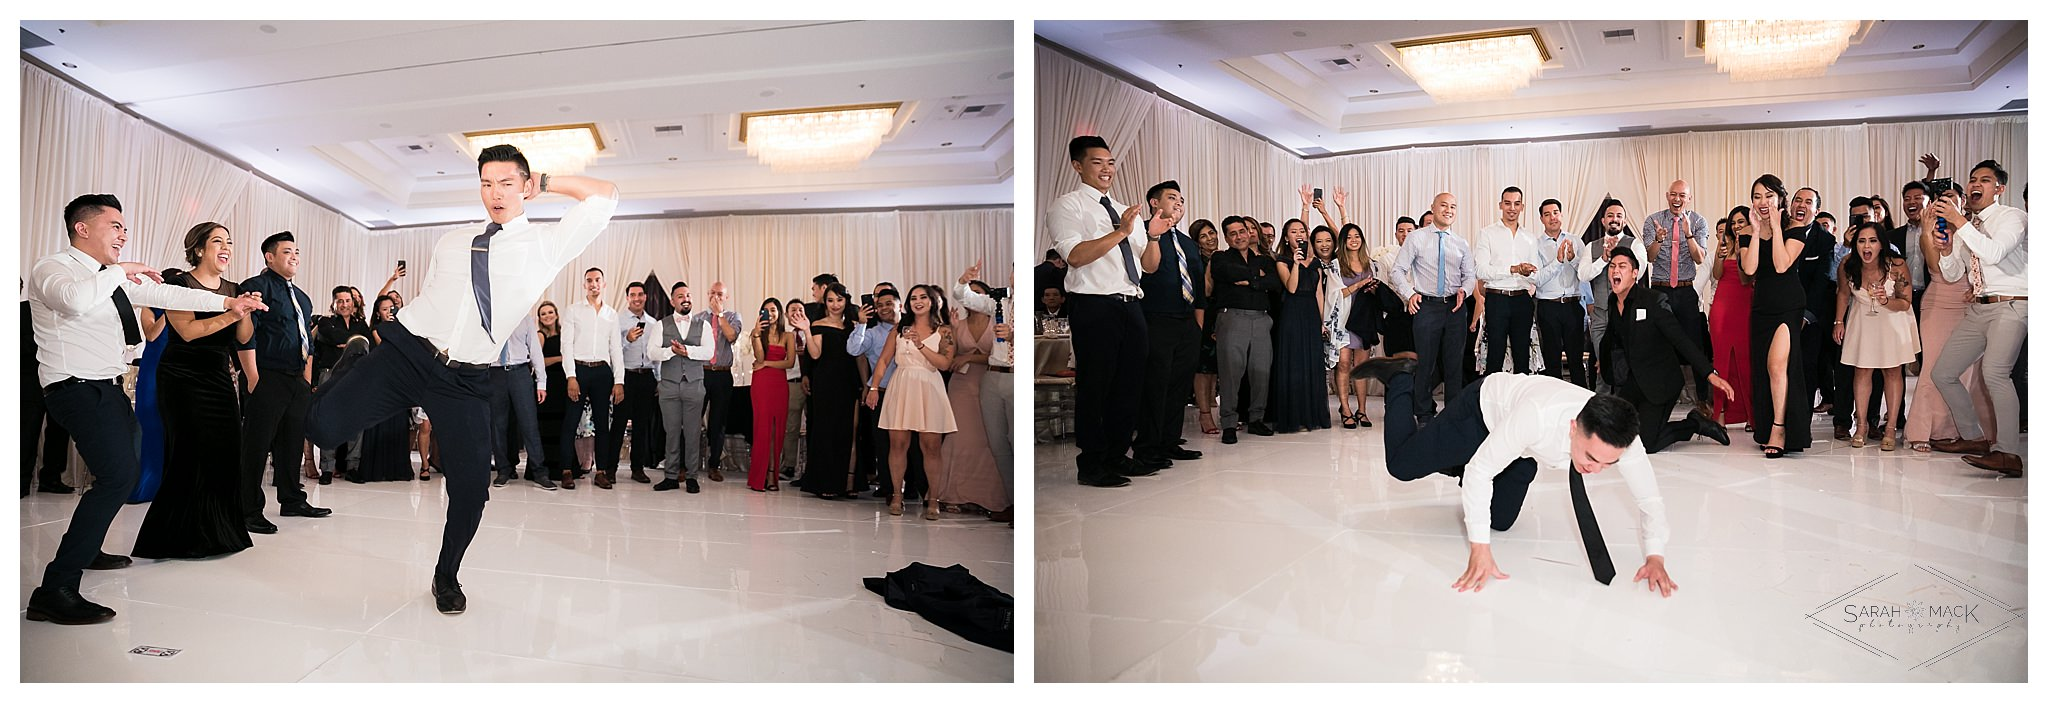 LE-Avenue-of-the-Arts-Costa-Mesa-Wedding-Photography-0218.jpg